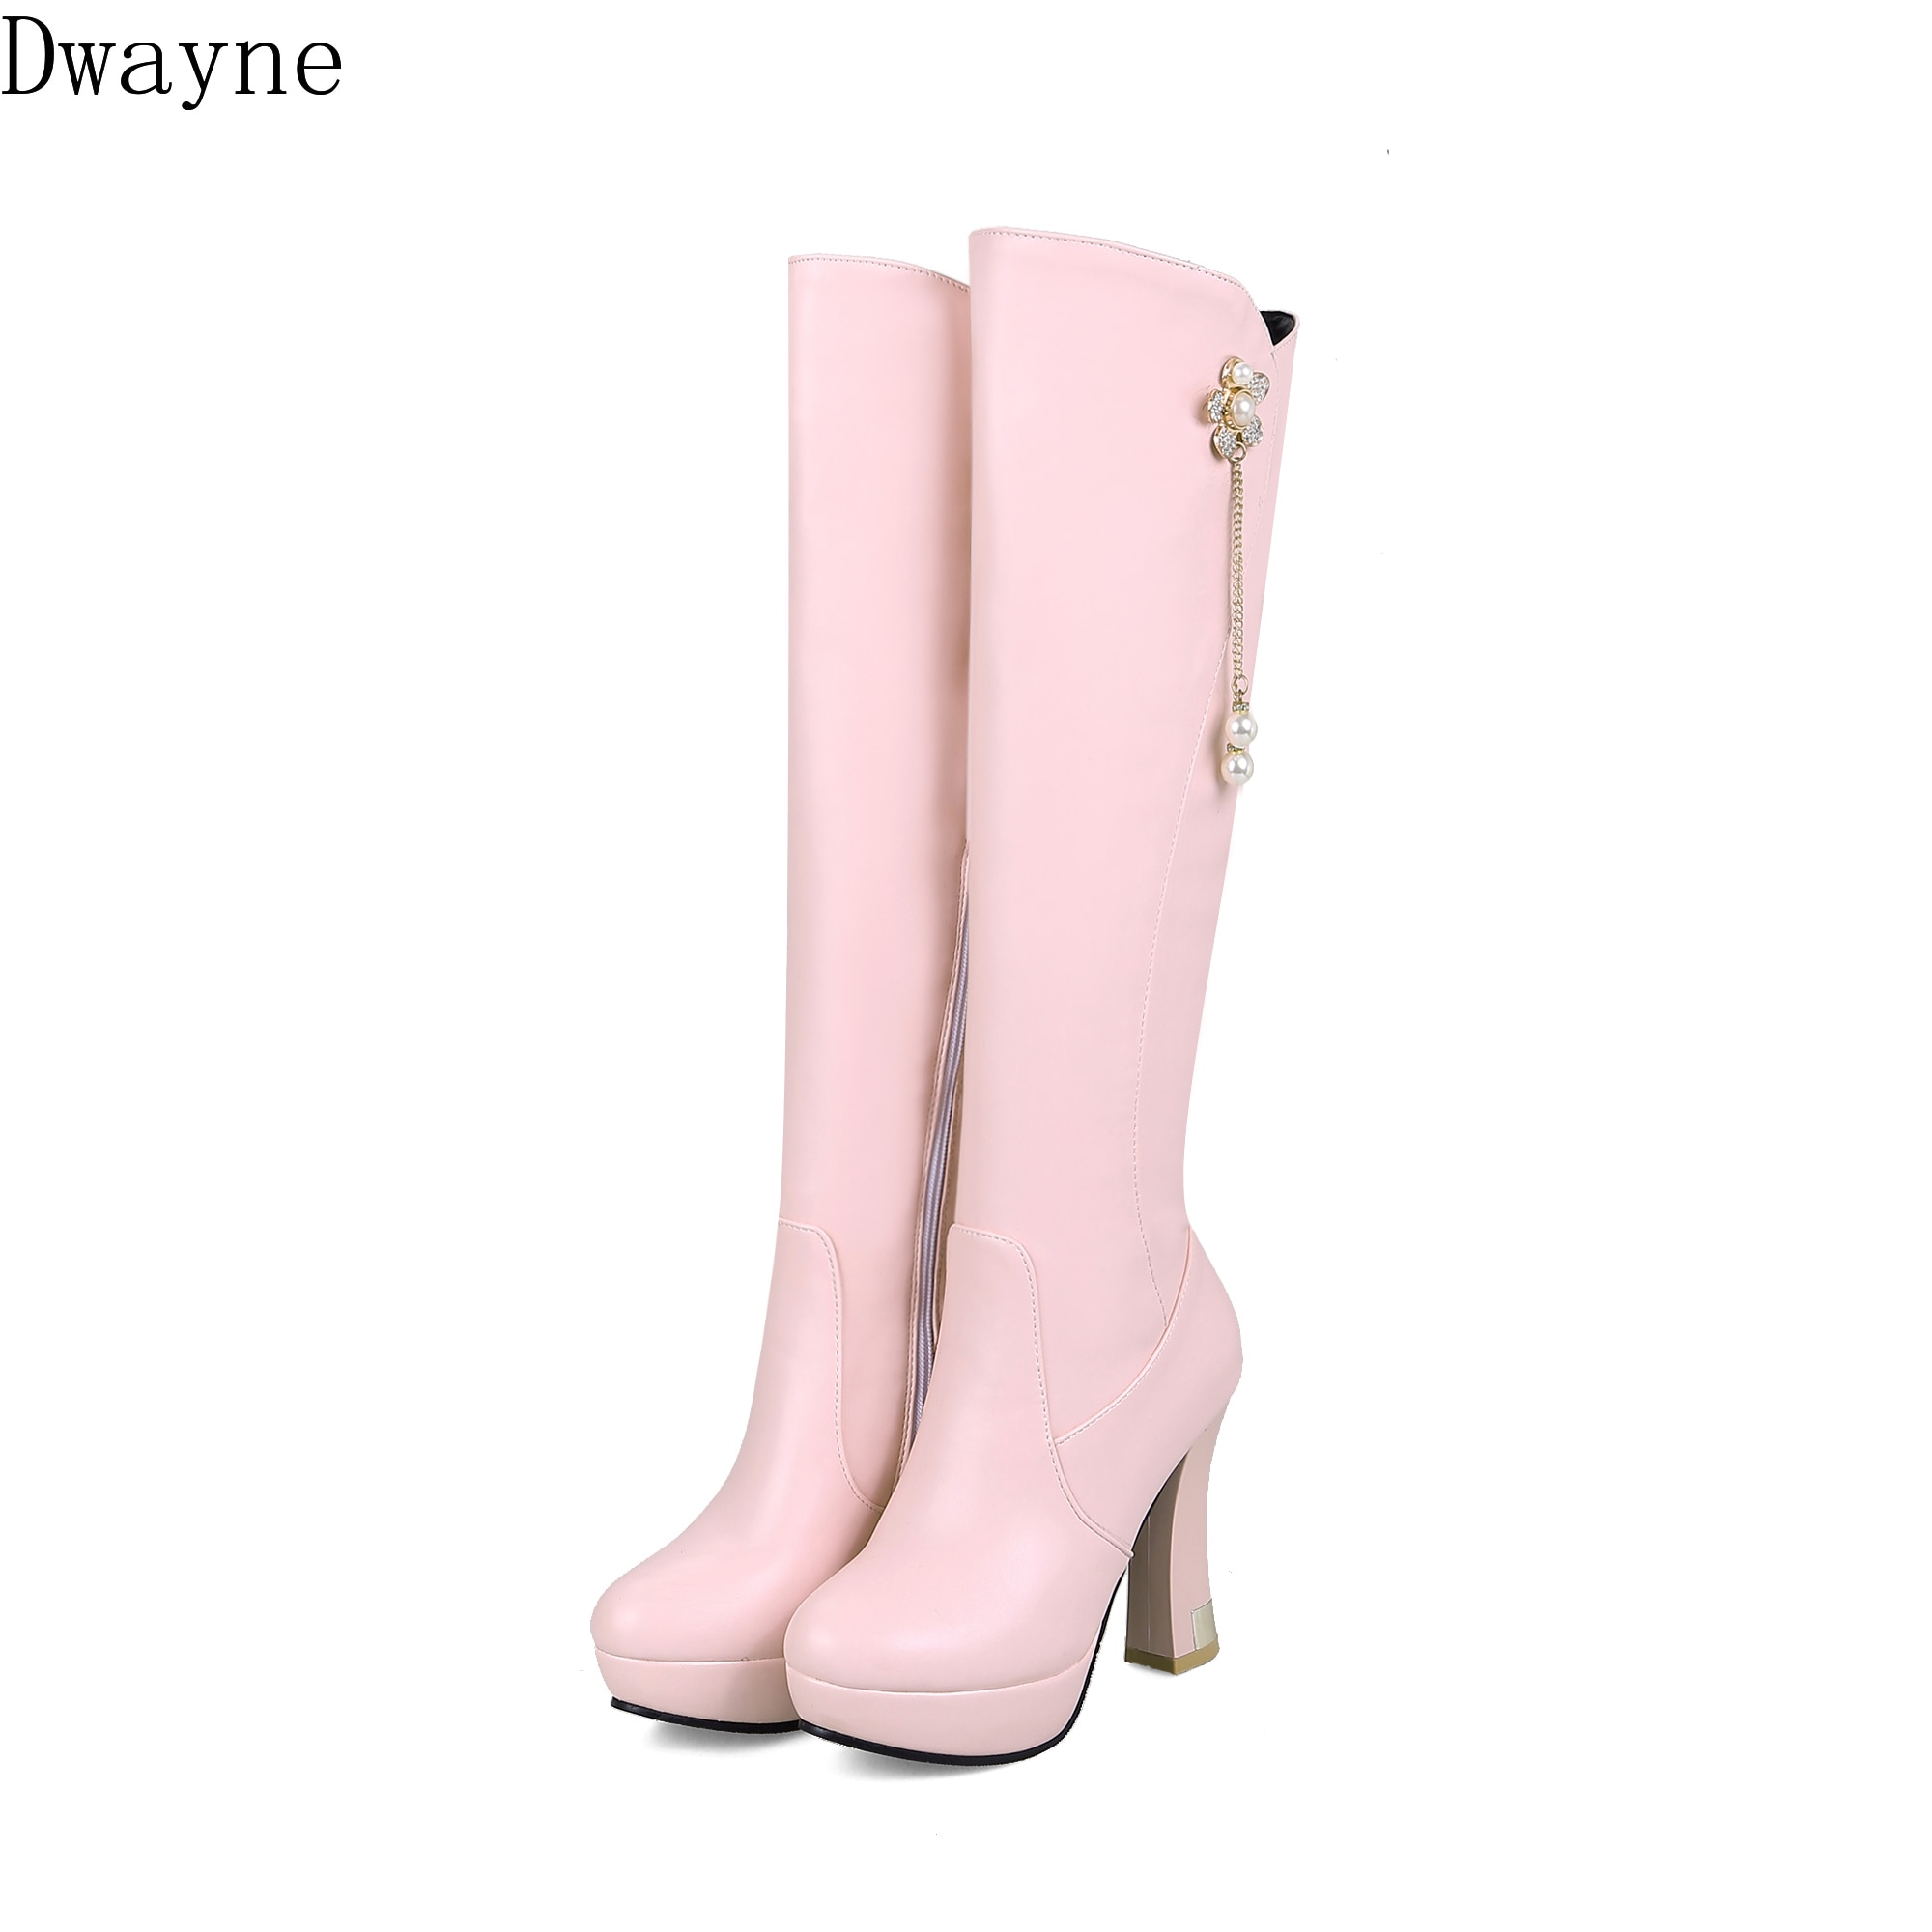 Cremallera lateral, Invierno 2020, borla de Perla Nueva, tacón alto, botas Martin de tubo largo para mujer